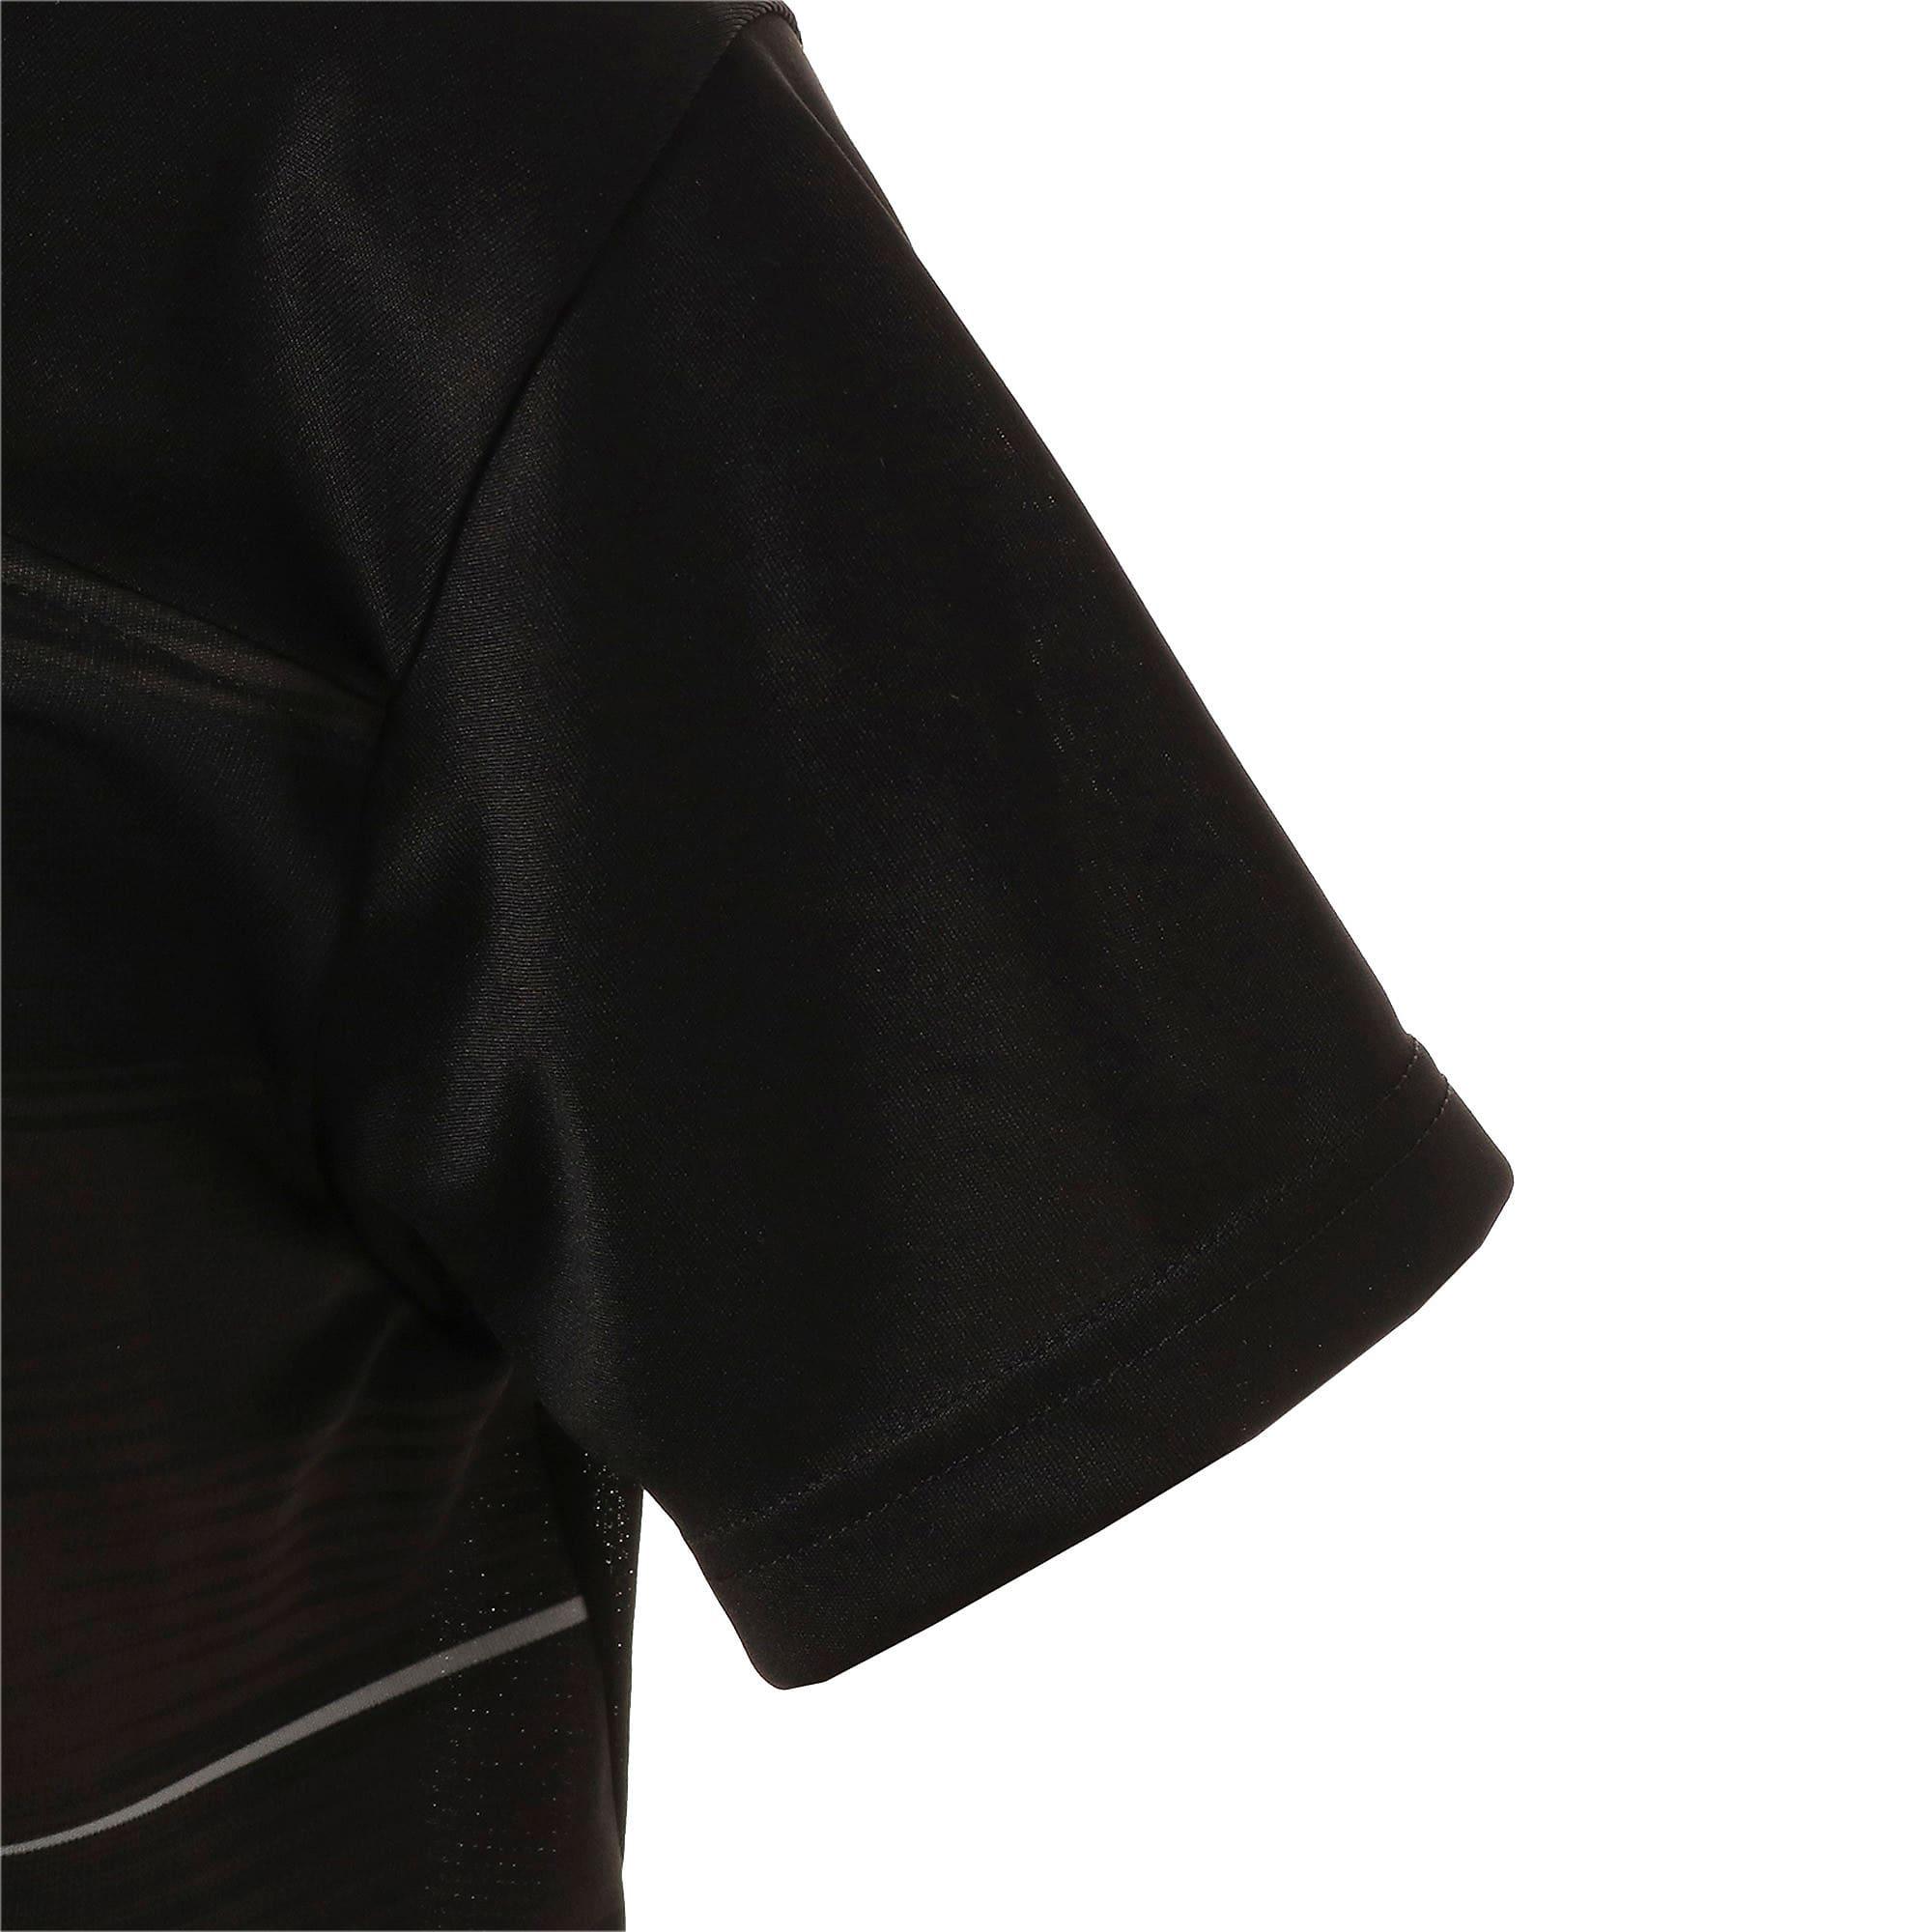 Thumbnail 5 of キッズ FTBLNXT ジュニア グラフィック シャツ, Puma Black-Phantom Black, medium-JPN